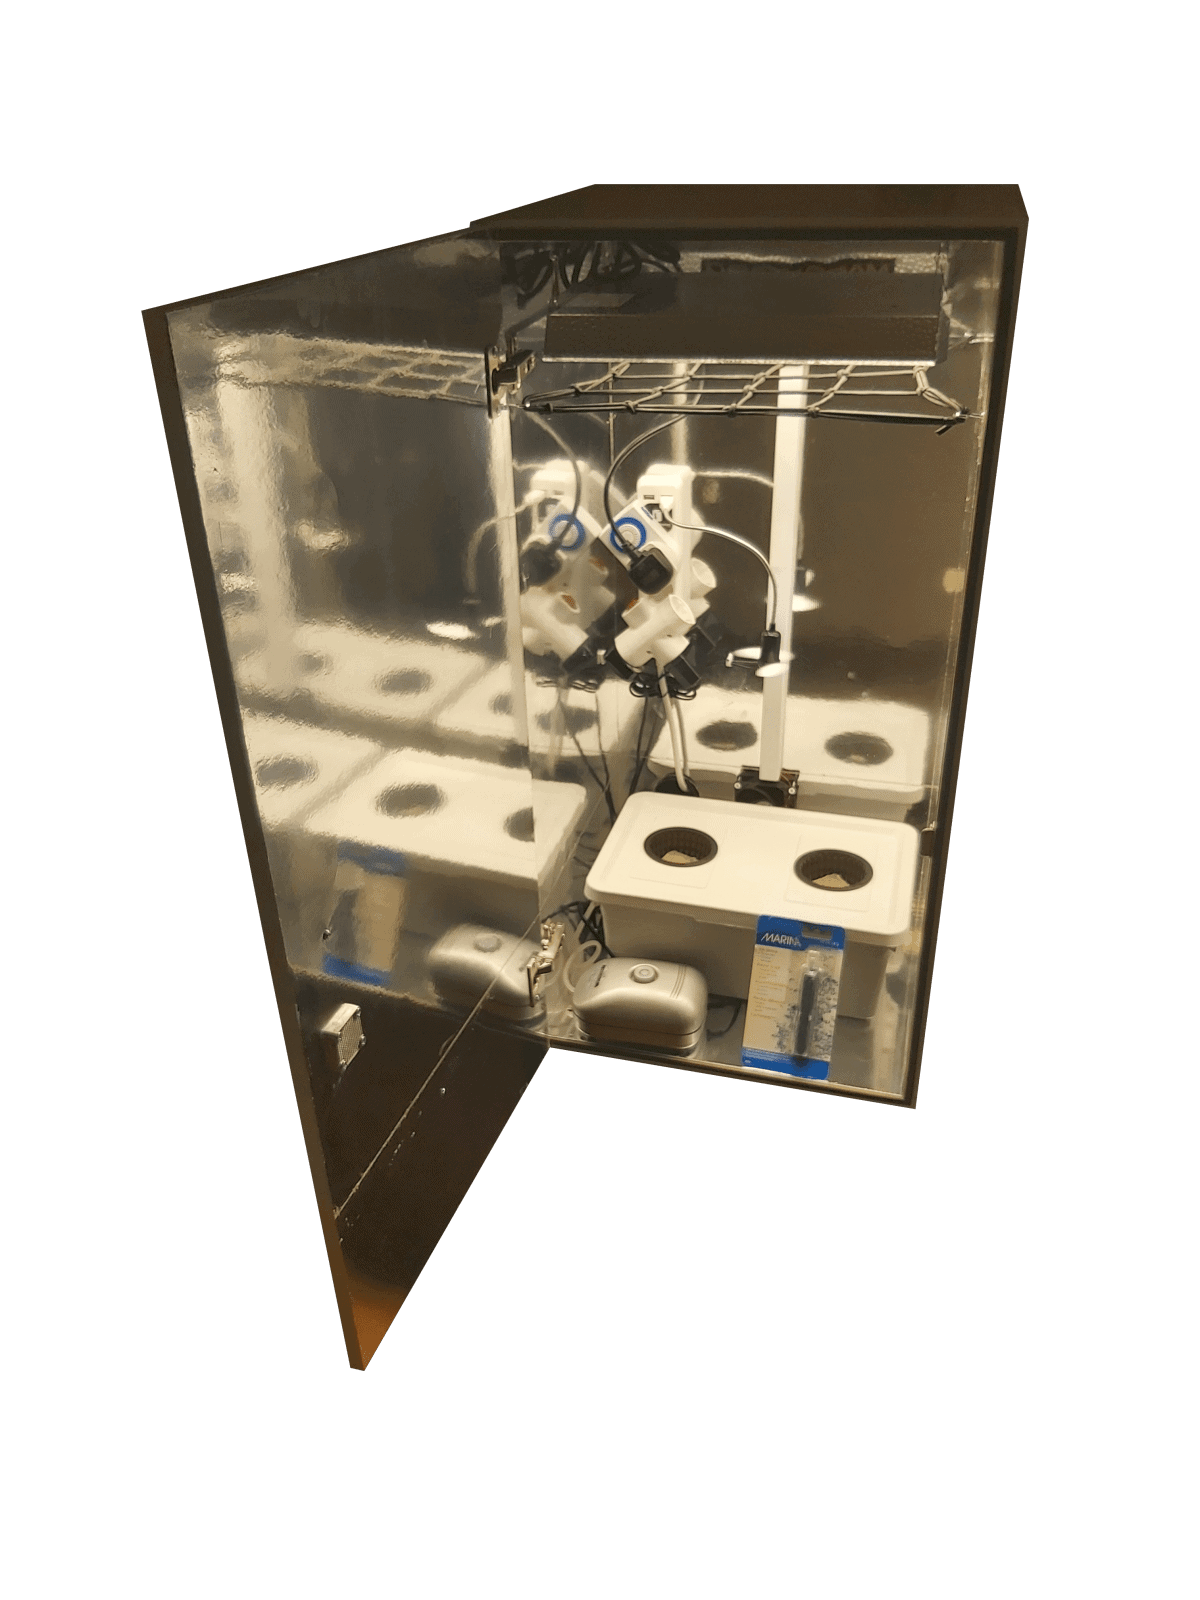 Hydroponic Led stealth grow box